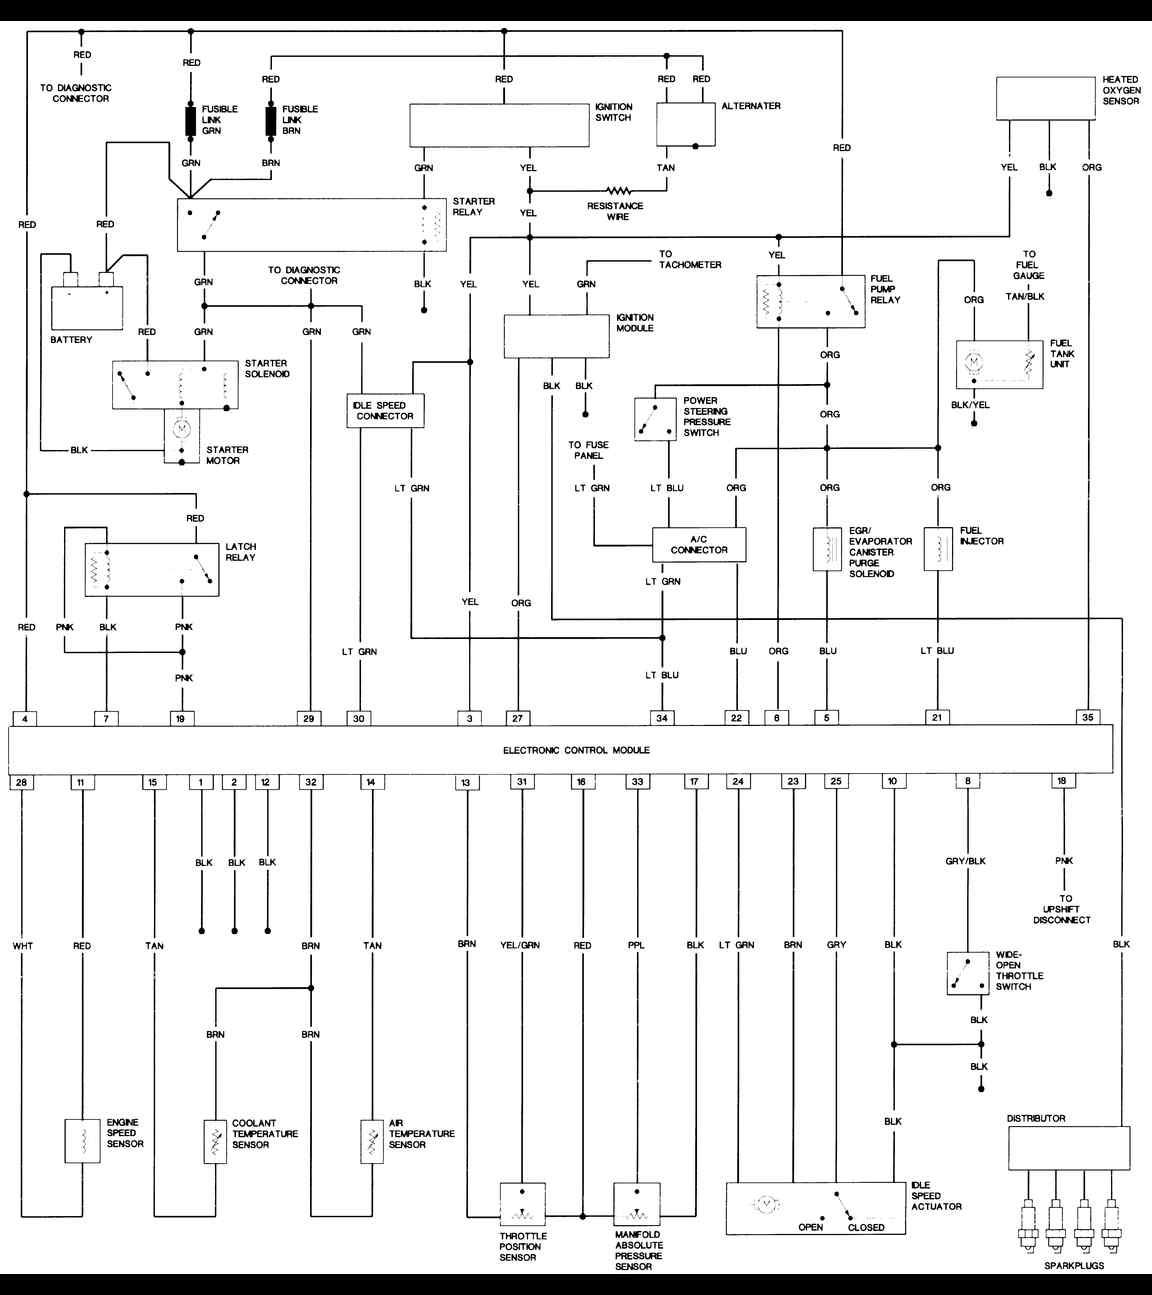 mitsubishi l alternator wiring diagram torzone org Motorola Alternator Wiring Diagram 3 Wire Alternator Wiring Diagram